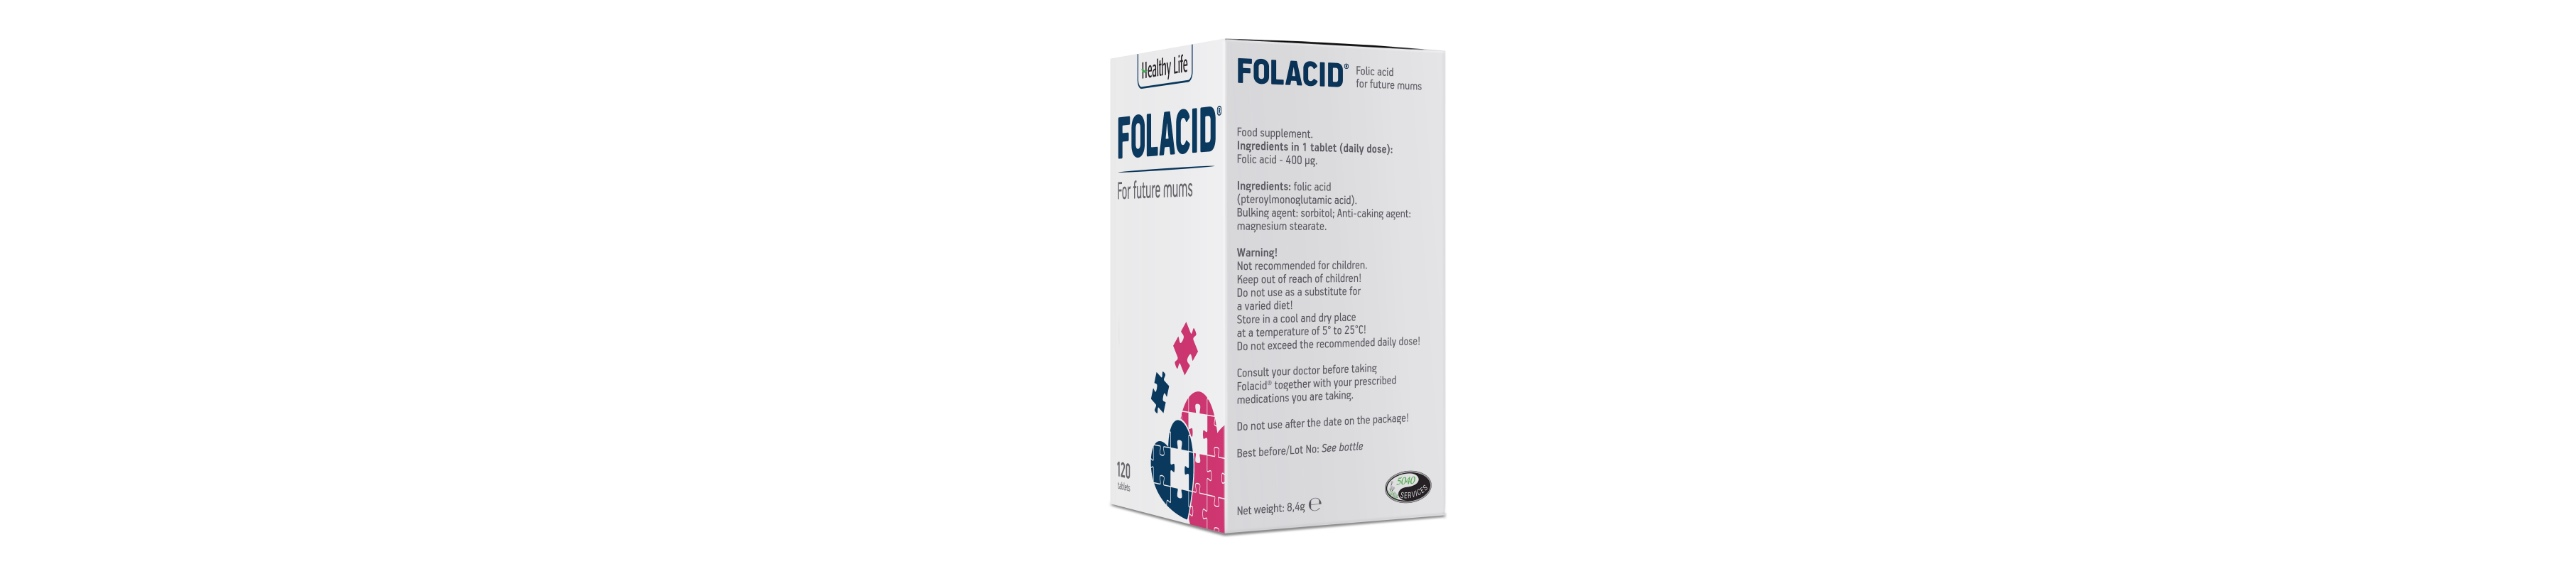 P3-Slider-img-FolacidM2